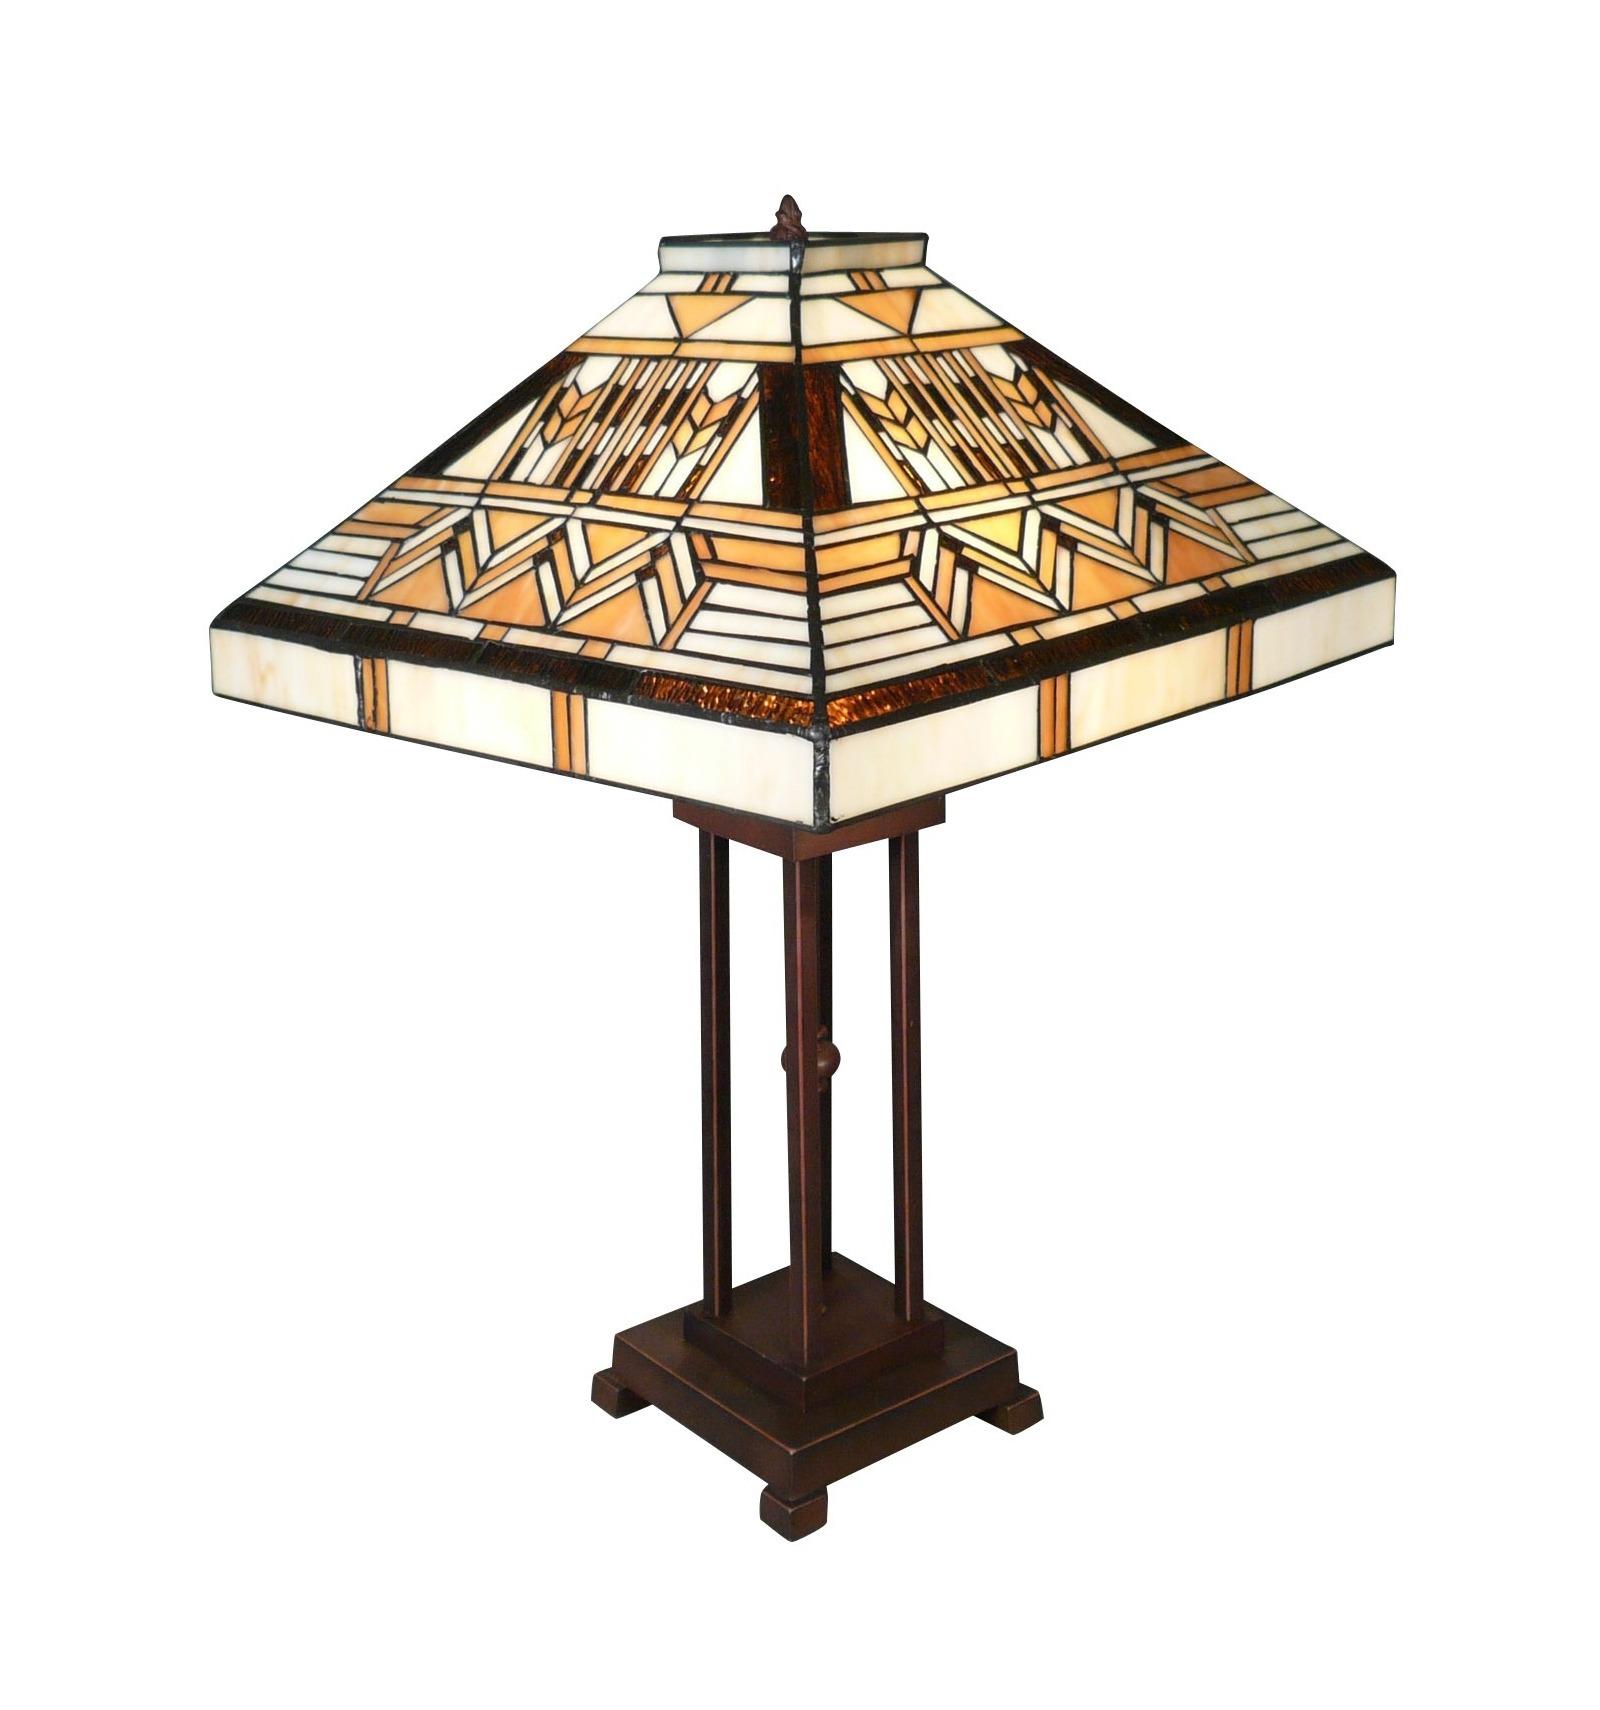 tiffany lampe art deco tiffany lampen. Black Bedroom Furniture Sets. Home Design Ideas